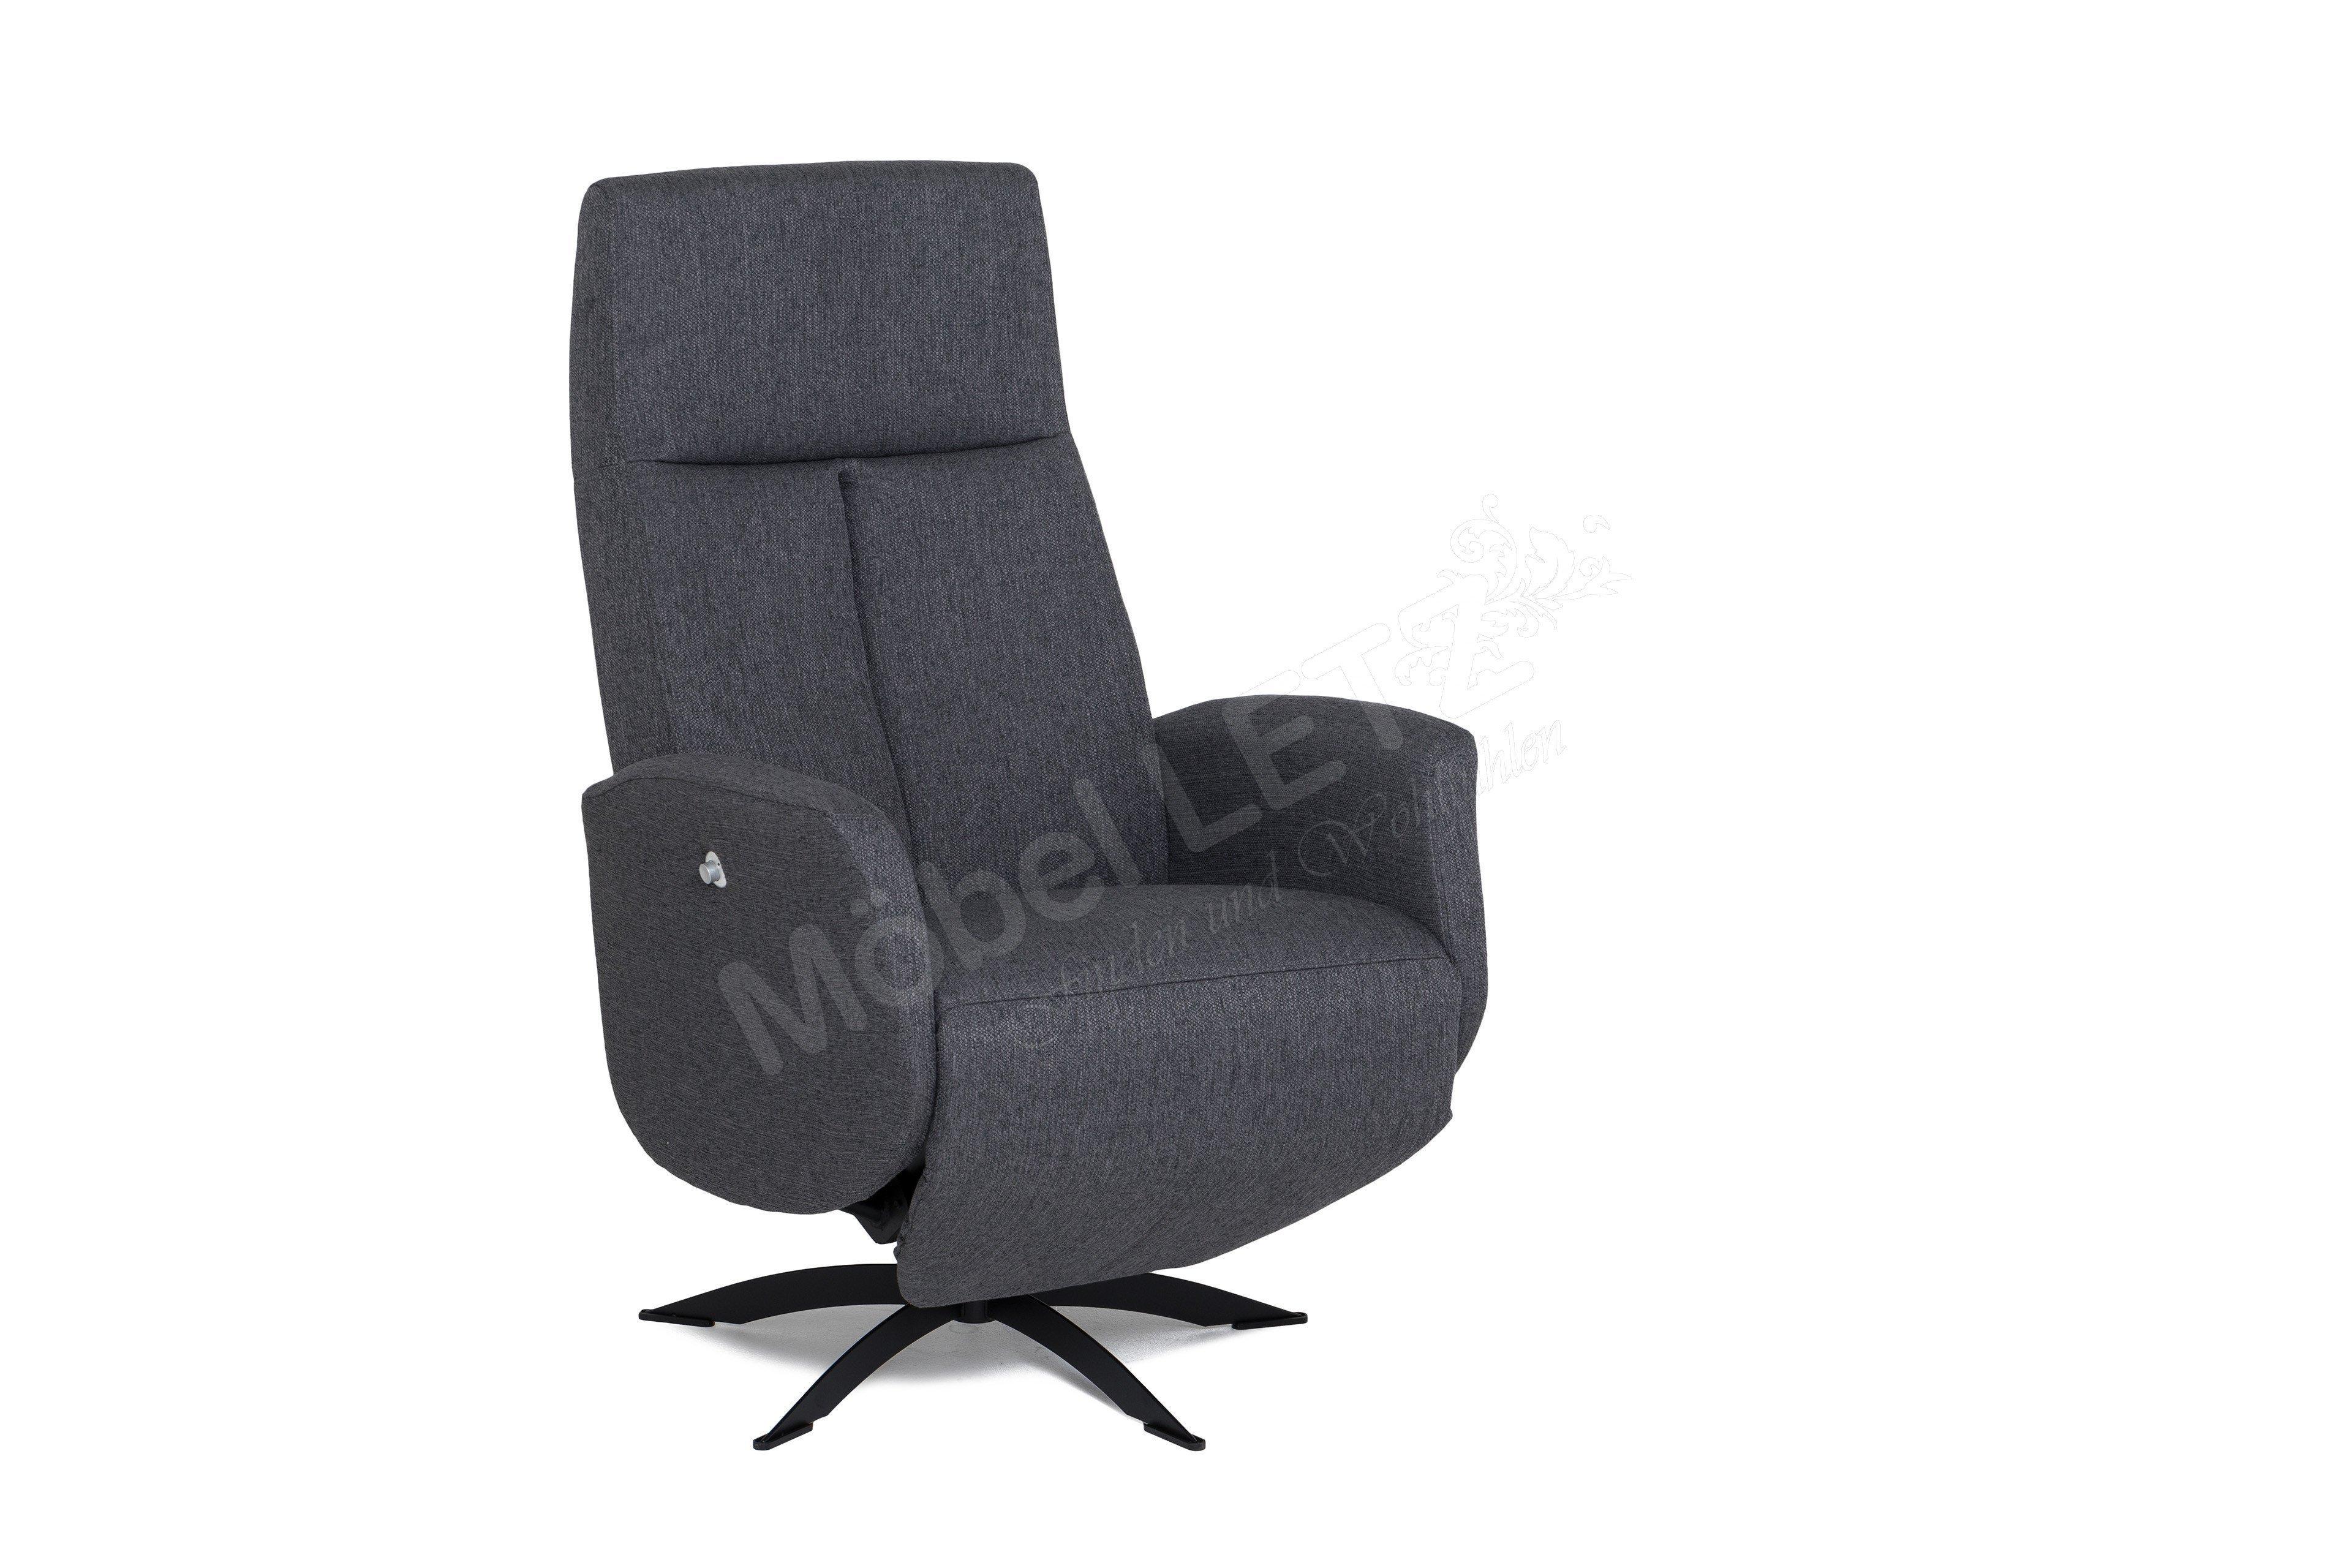 Hjort Knudsen 7091 Funktionssessel In Anthrazit Mobel Letz Ihr Online Shop